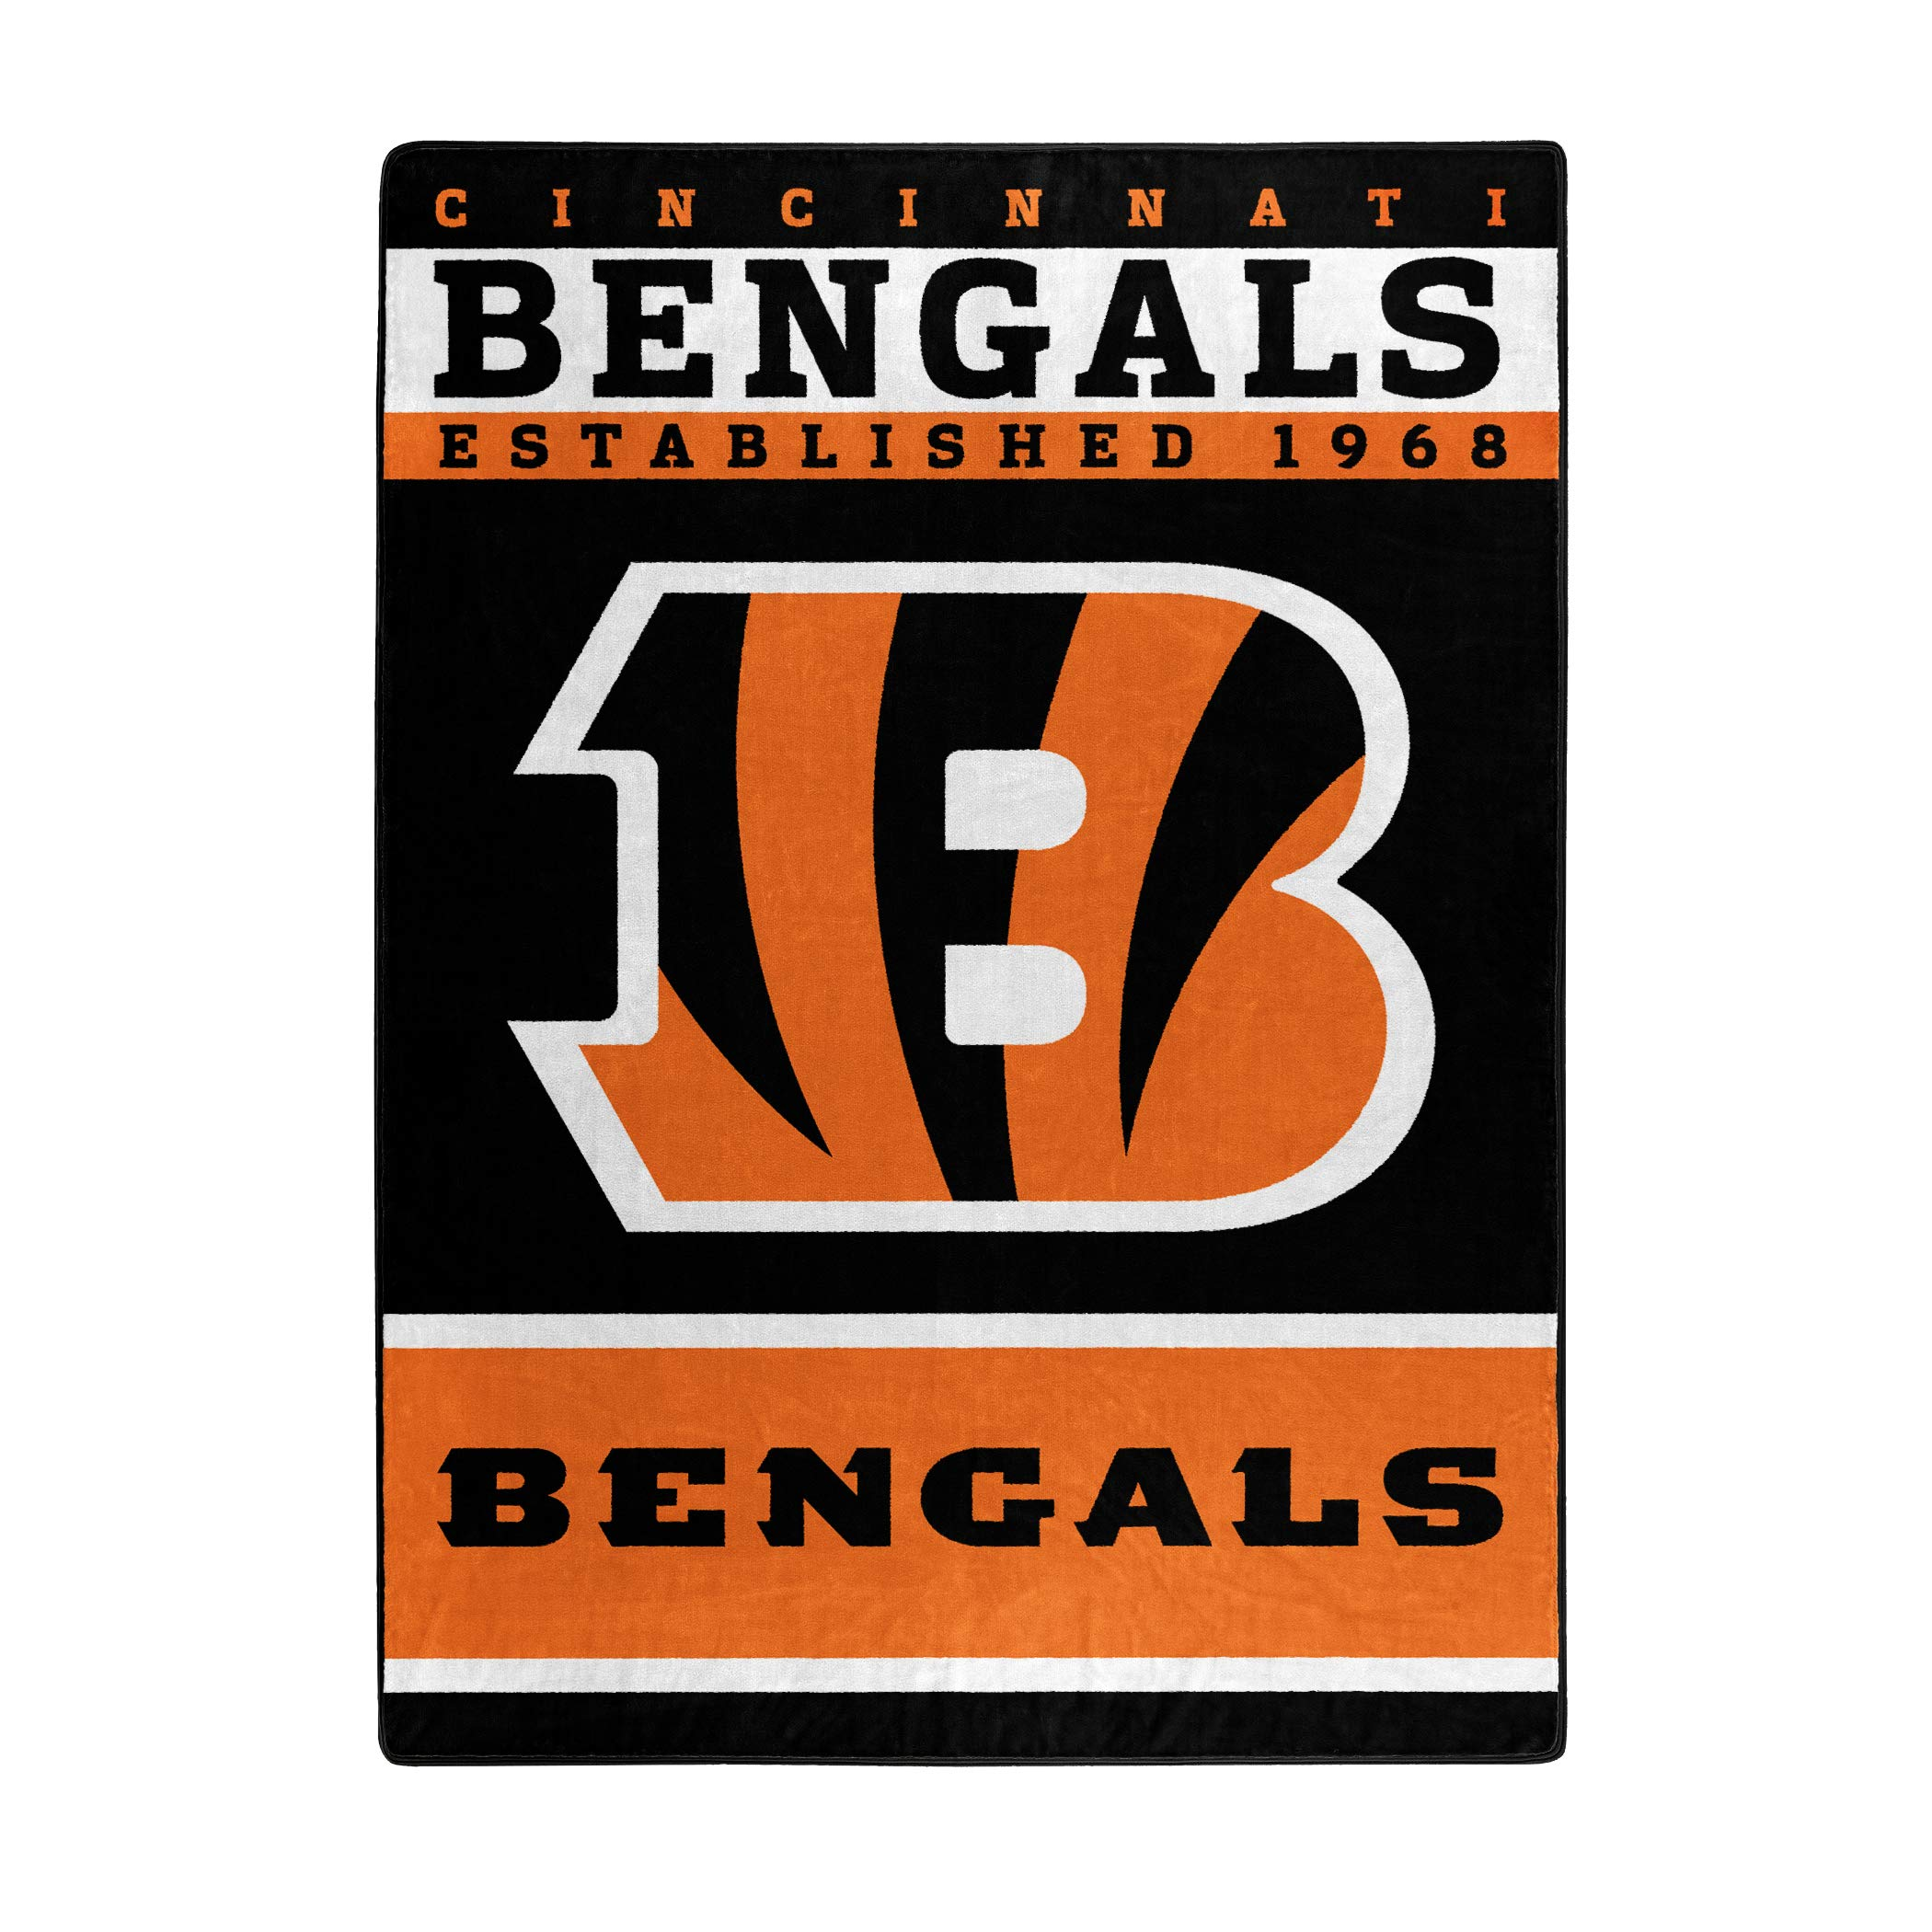 The Northwest Company Officially Licensed NFL Cincinnati Bengals 12th Man Plush Raschel Throw Blanket, 60'' x 80''